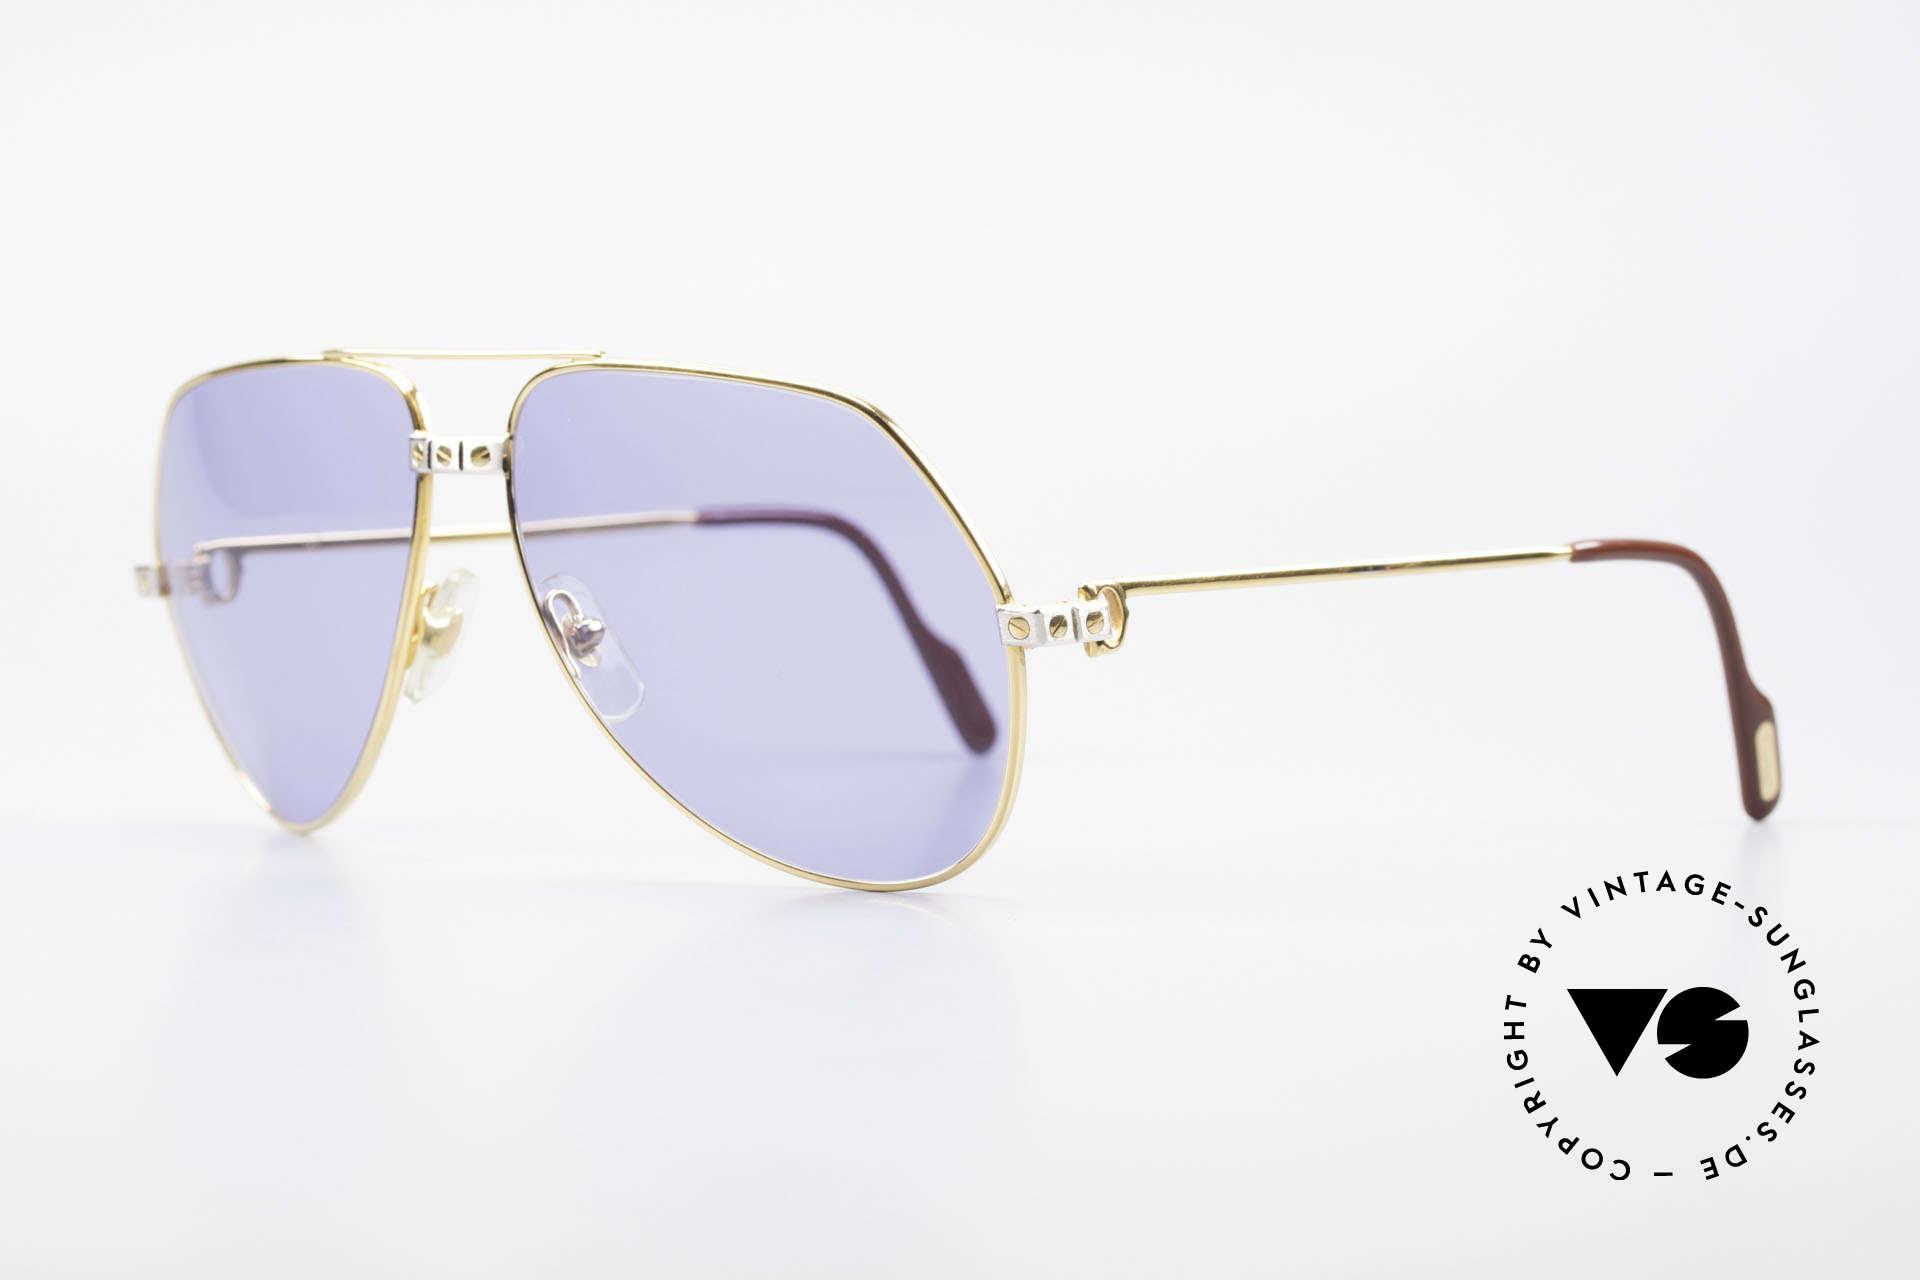 Cartier Vendome Santos - L 80's Luxury Aviator Sunglasses, Santos Decor (with 3 screws) in LARGE size 62-14, 140, Made for Men